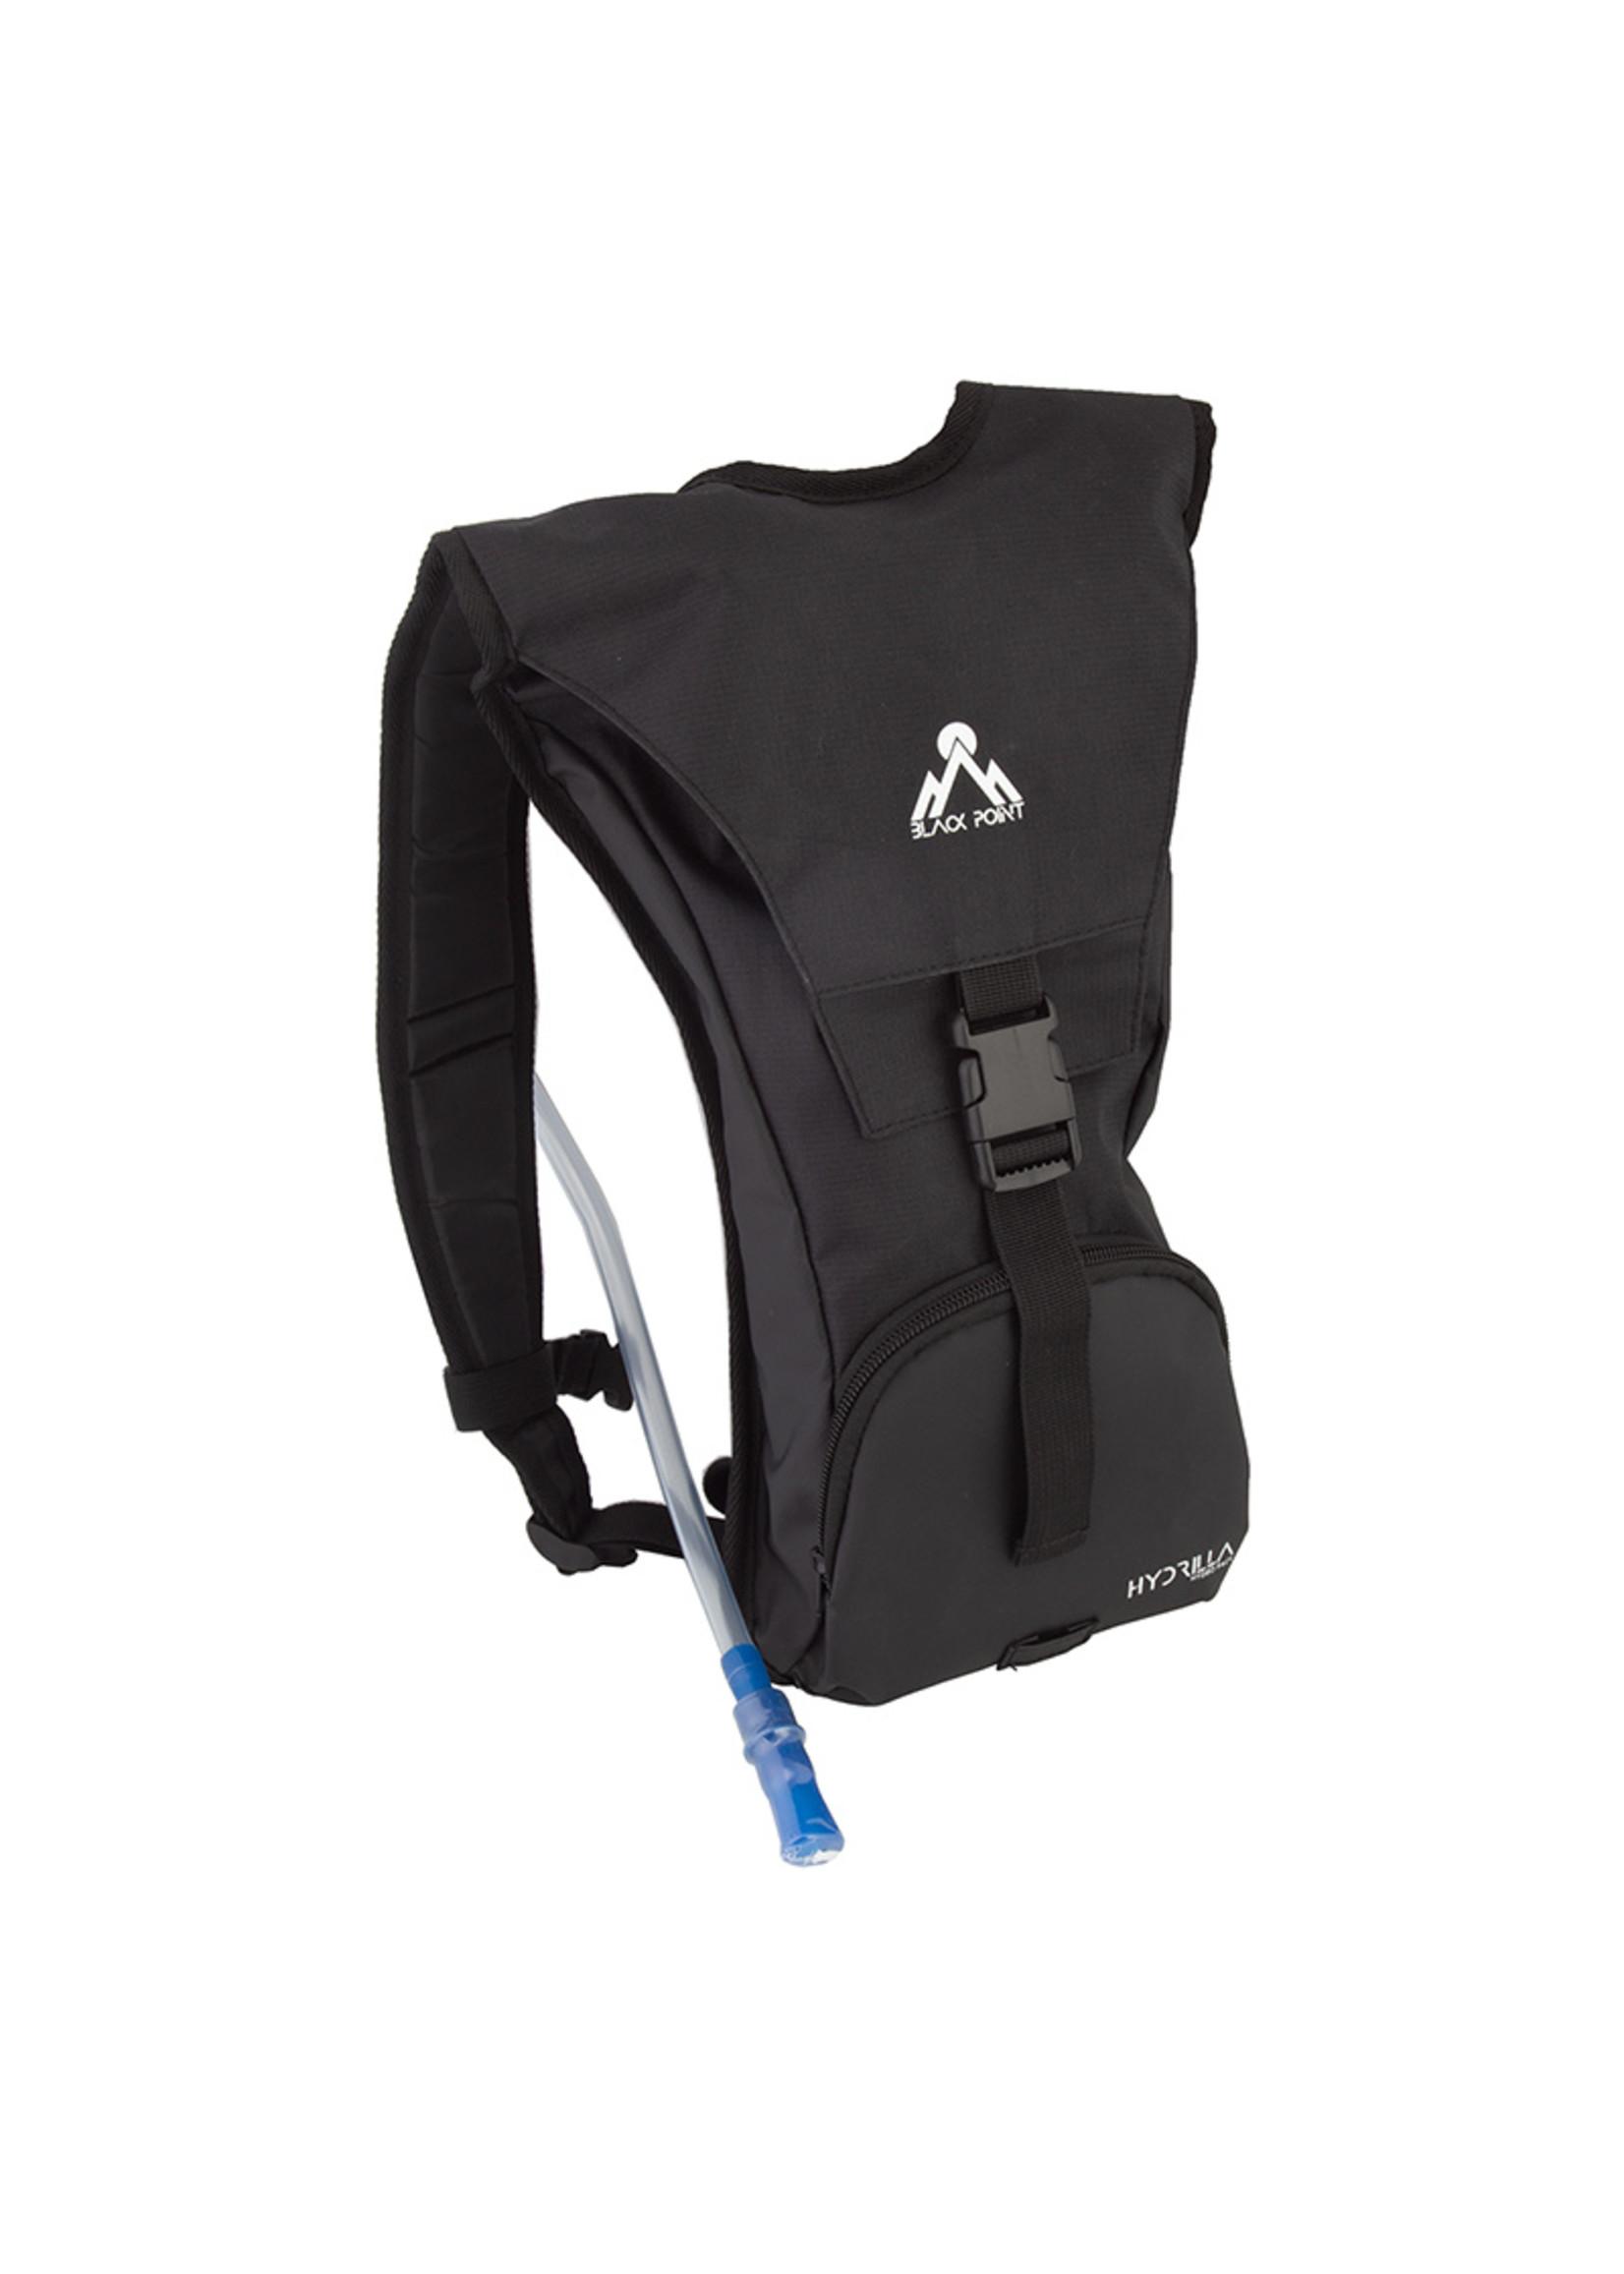 BLACK POINT BAG BKPOINT HYDRATION HYDRILLA BK w/3.0L BLADER